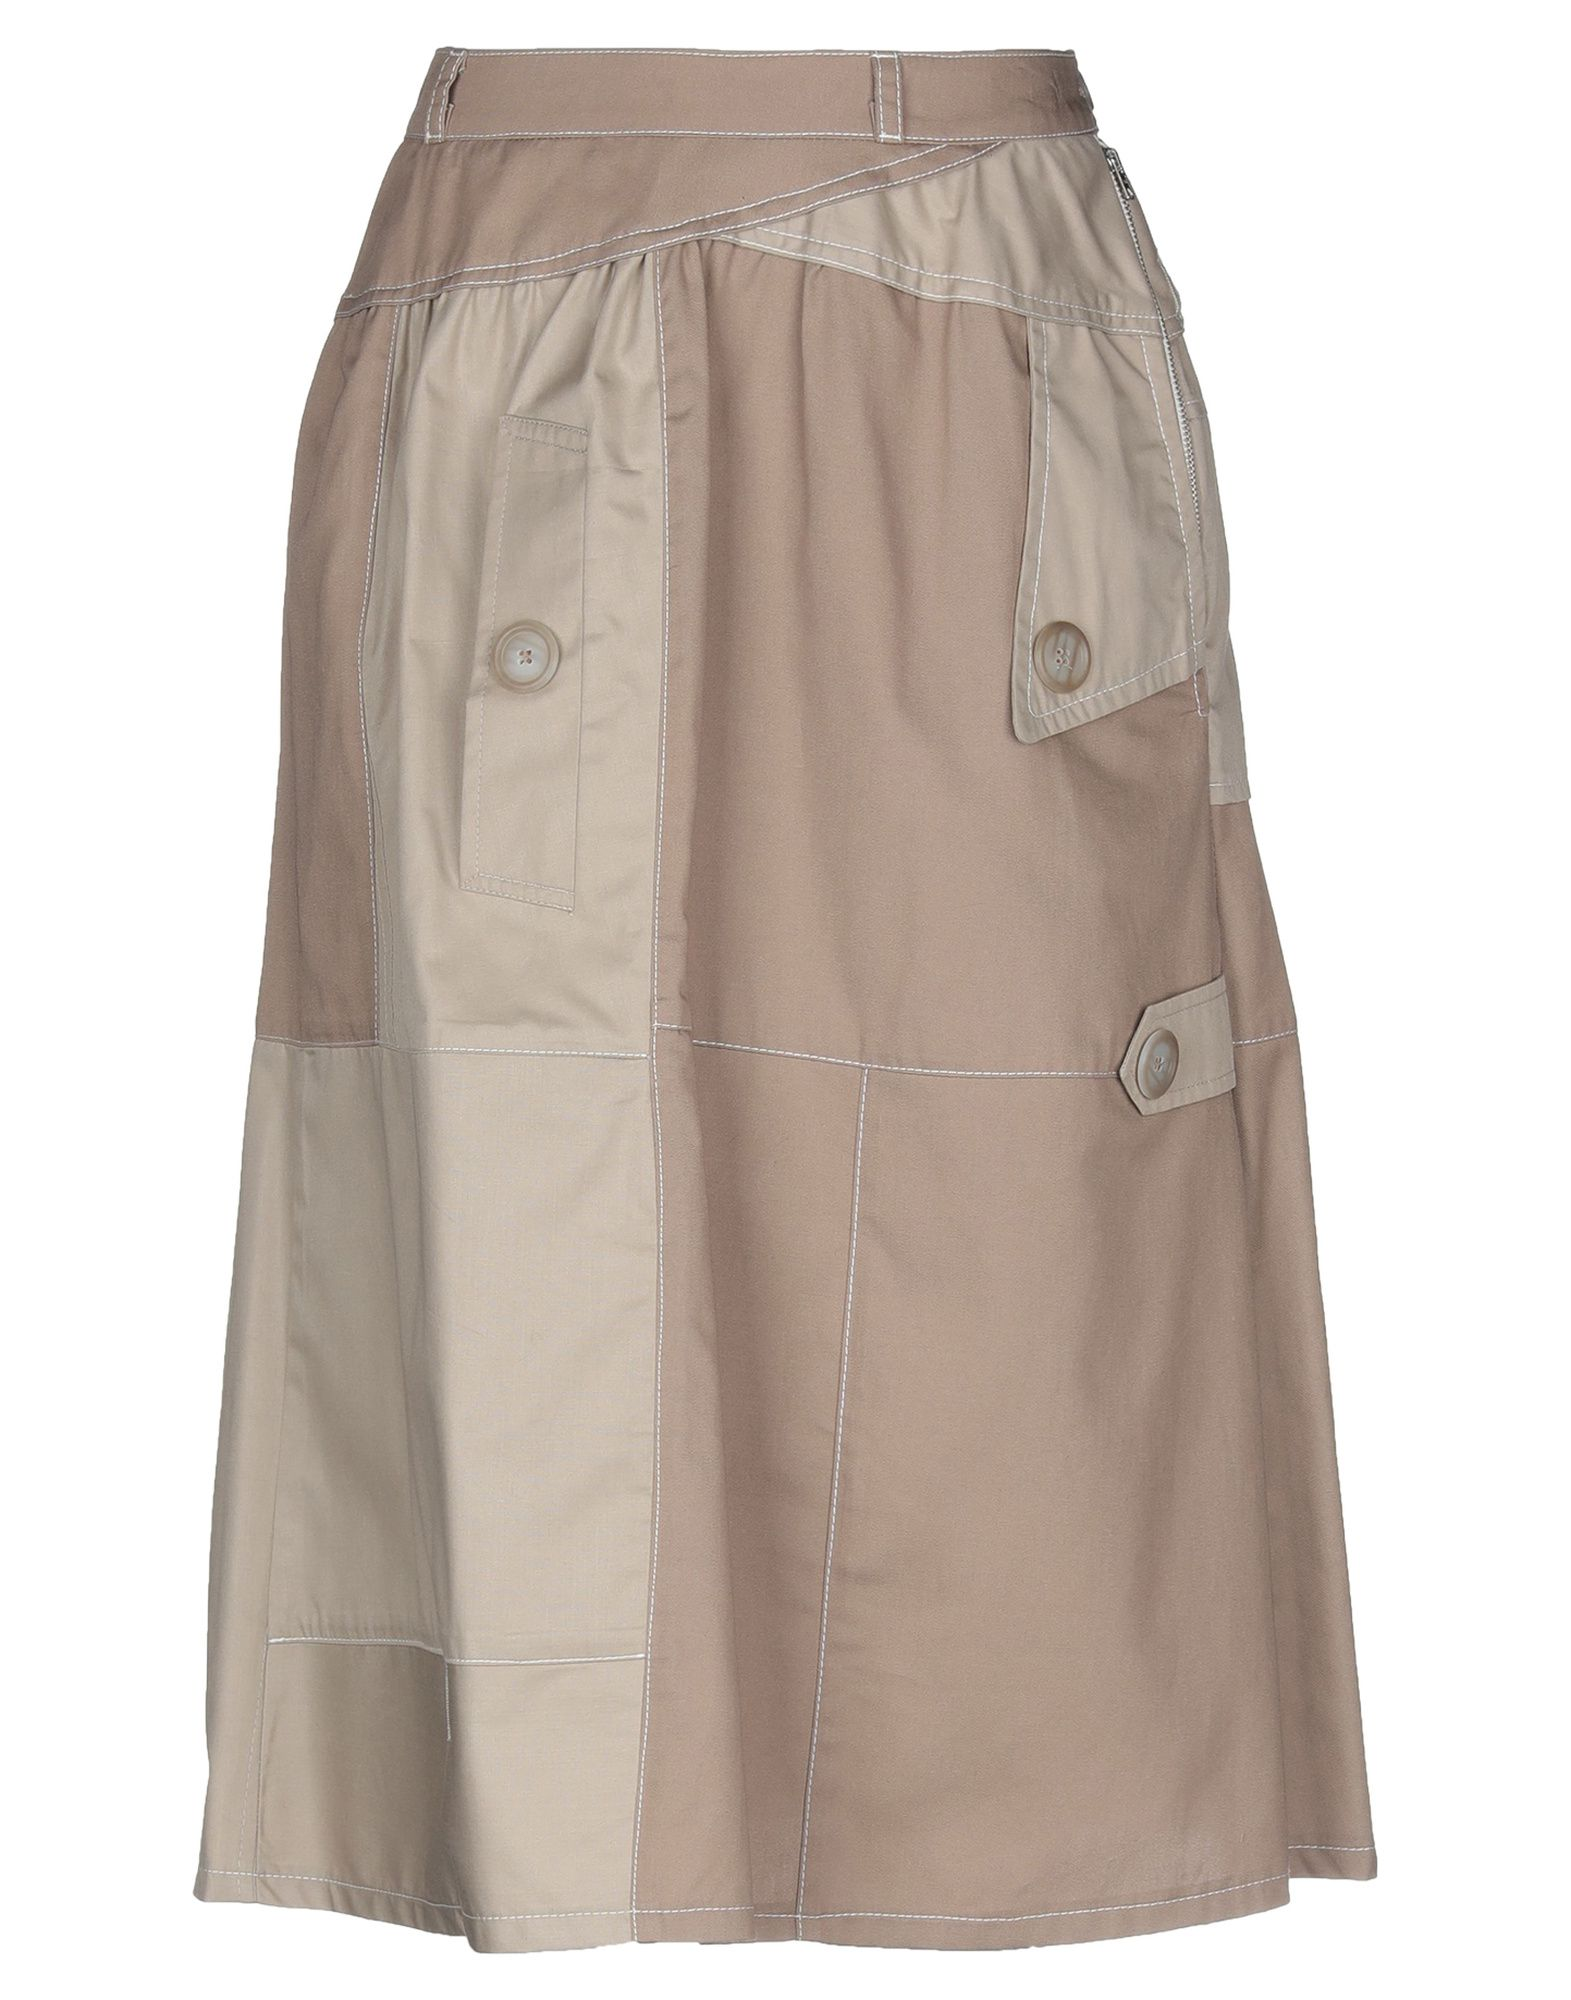 COLLECTION PRIVĒE? Юбка длиной 3/4 sh collection юбка длиной 3 4